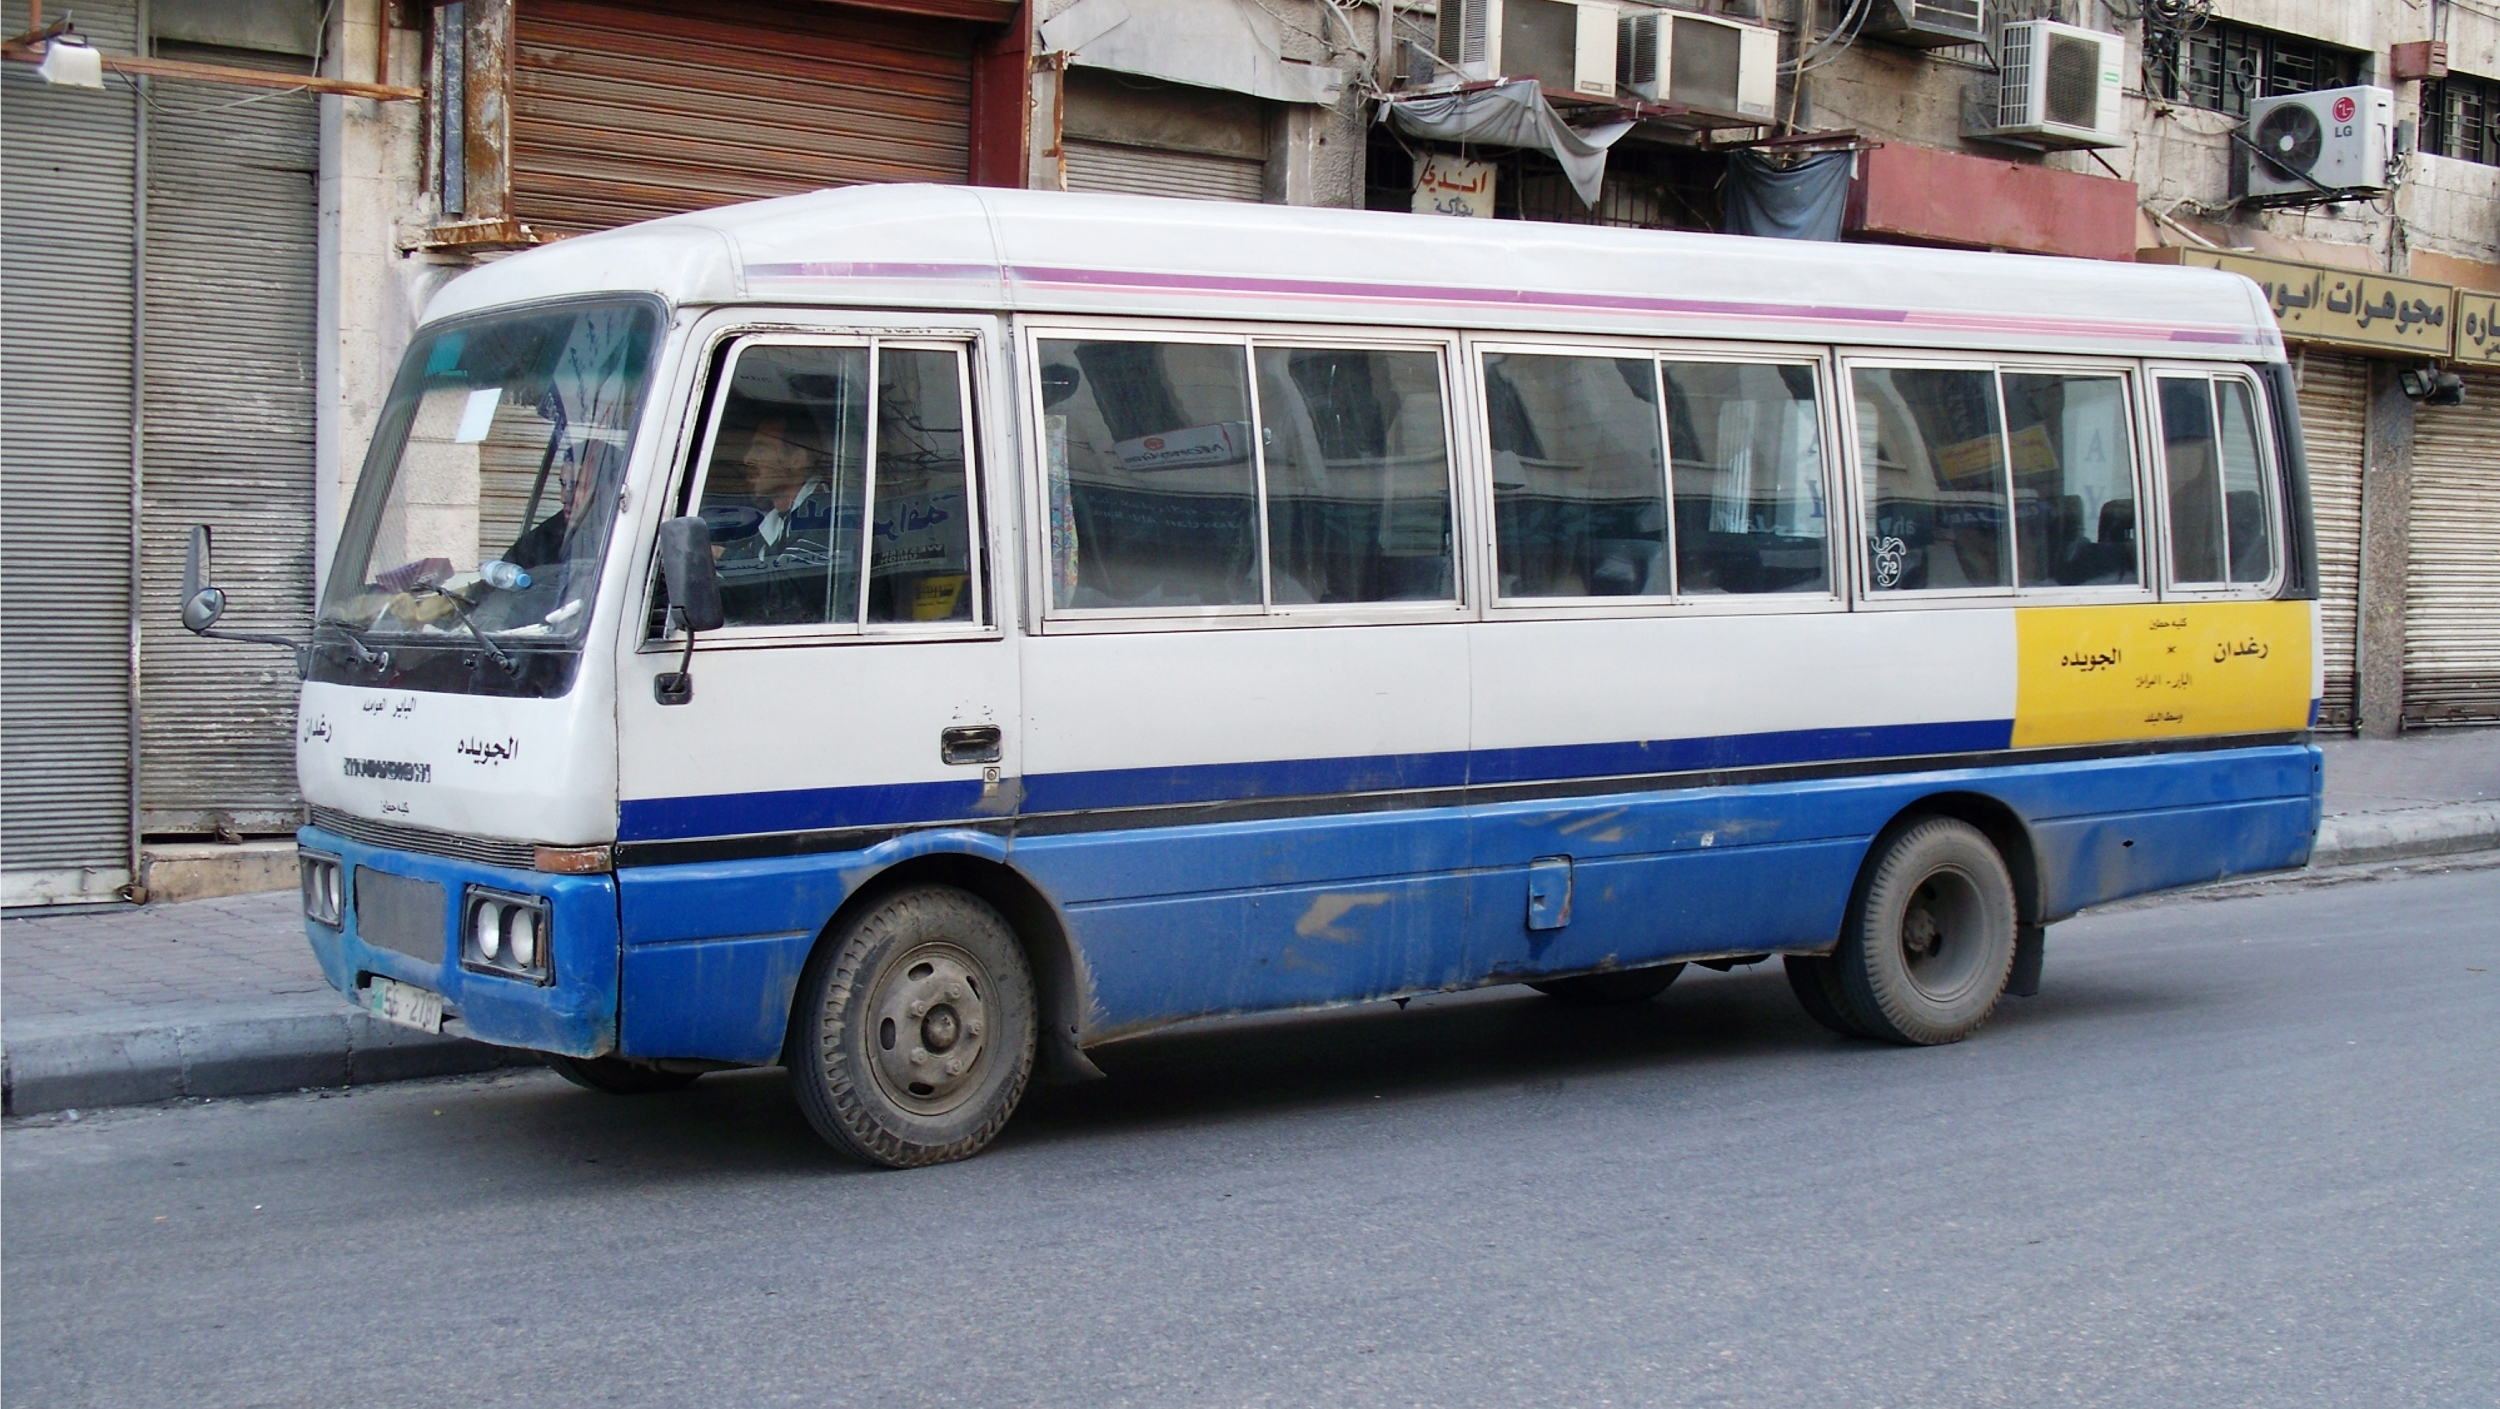 File Mitsubishi Bus In Jordan Jpg Wikimedia Commons